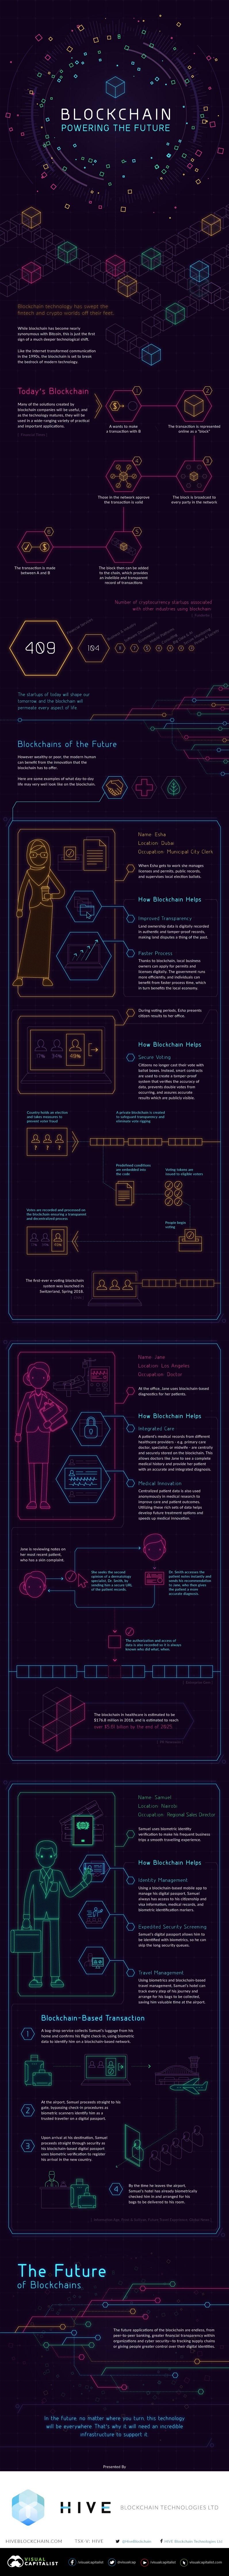 https://tfetimes.com/wp-content/uploads/2018/10/Blockchain-Powering-info.jpg